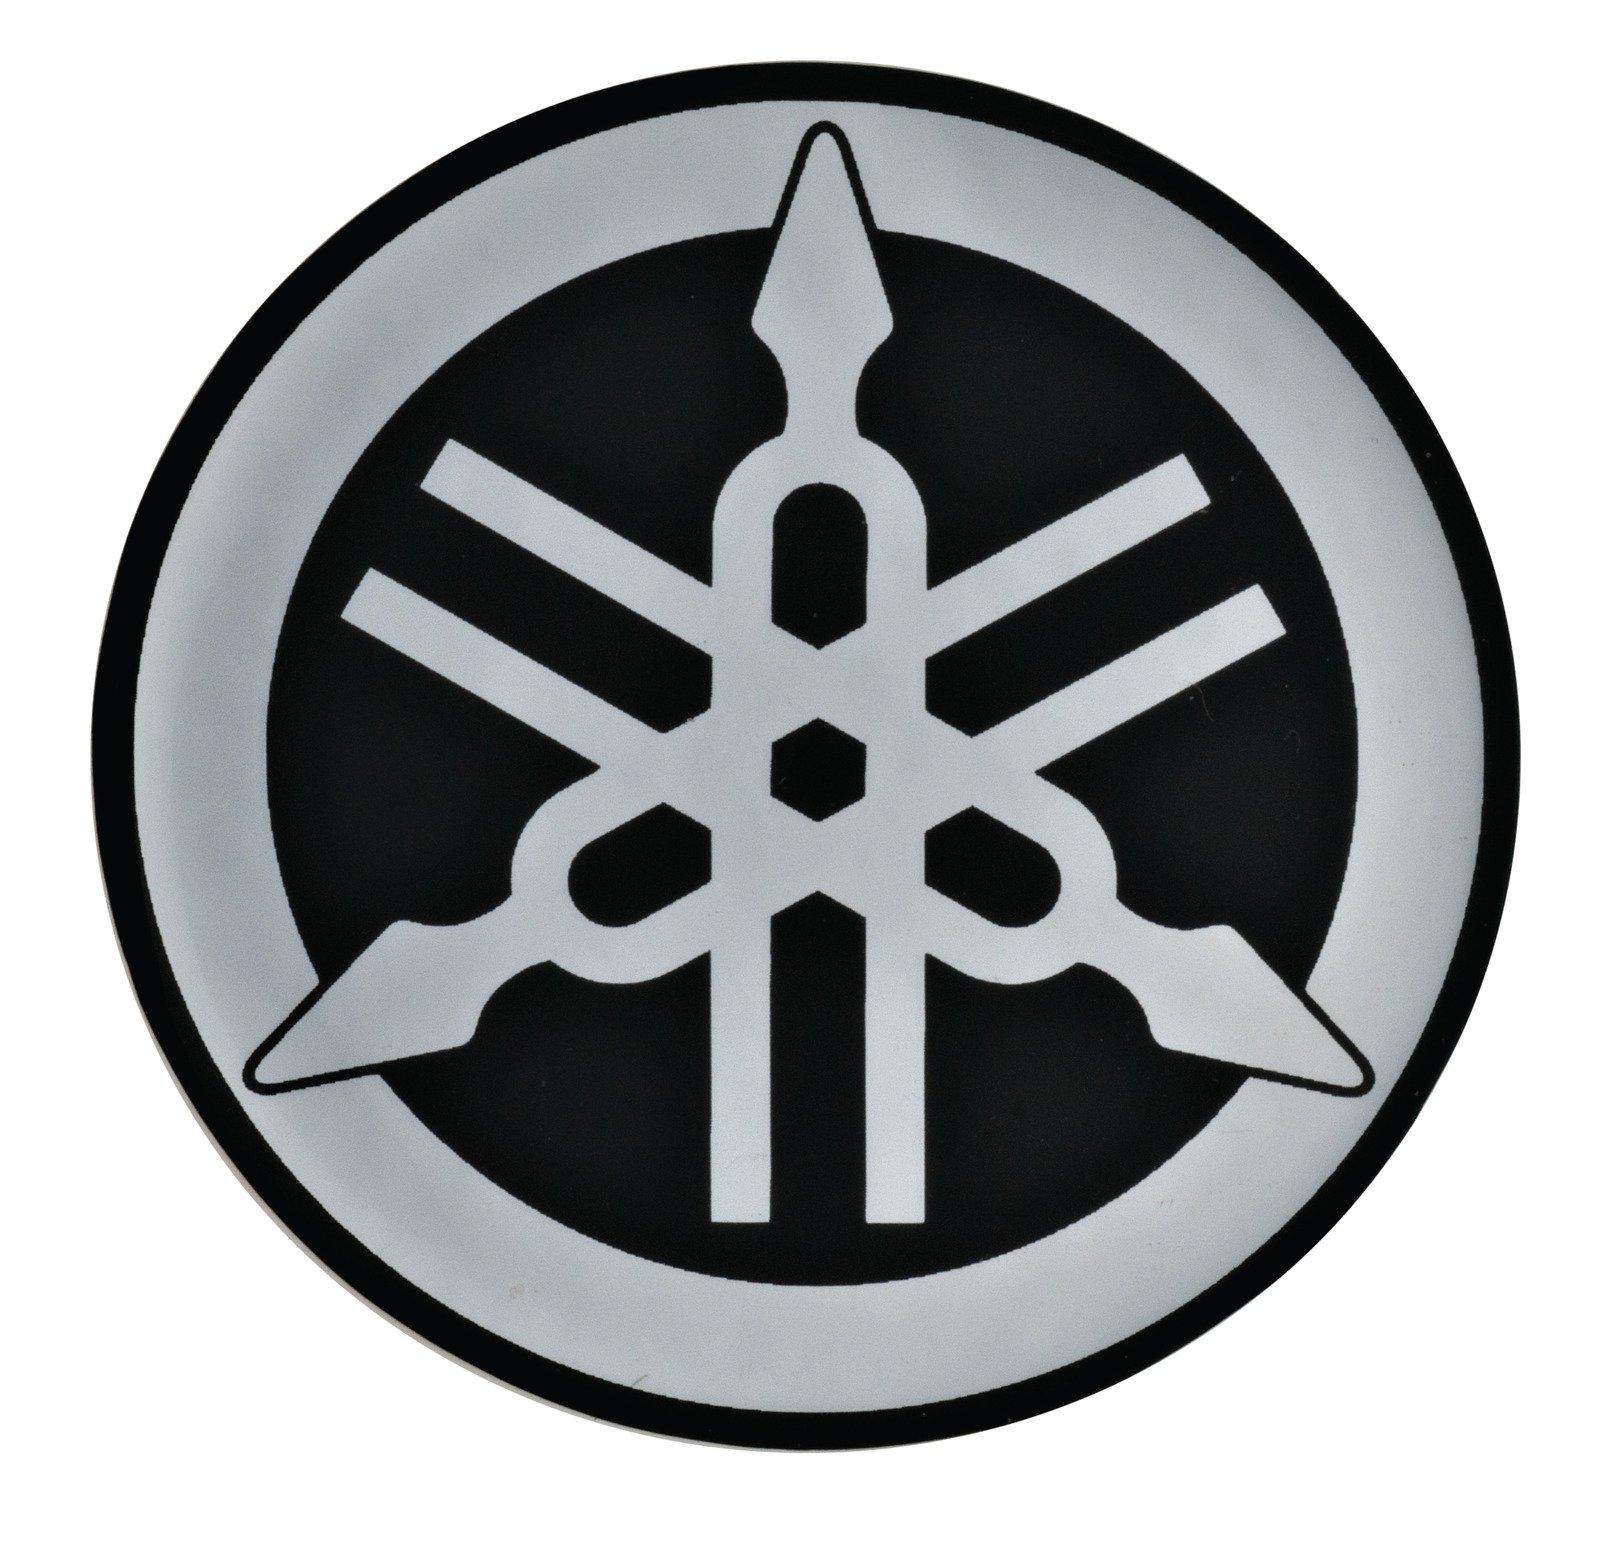 Epoxy Dome Diapson Yamaha Logo Emblem Decal Sticker  1-135